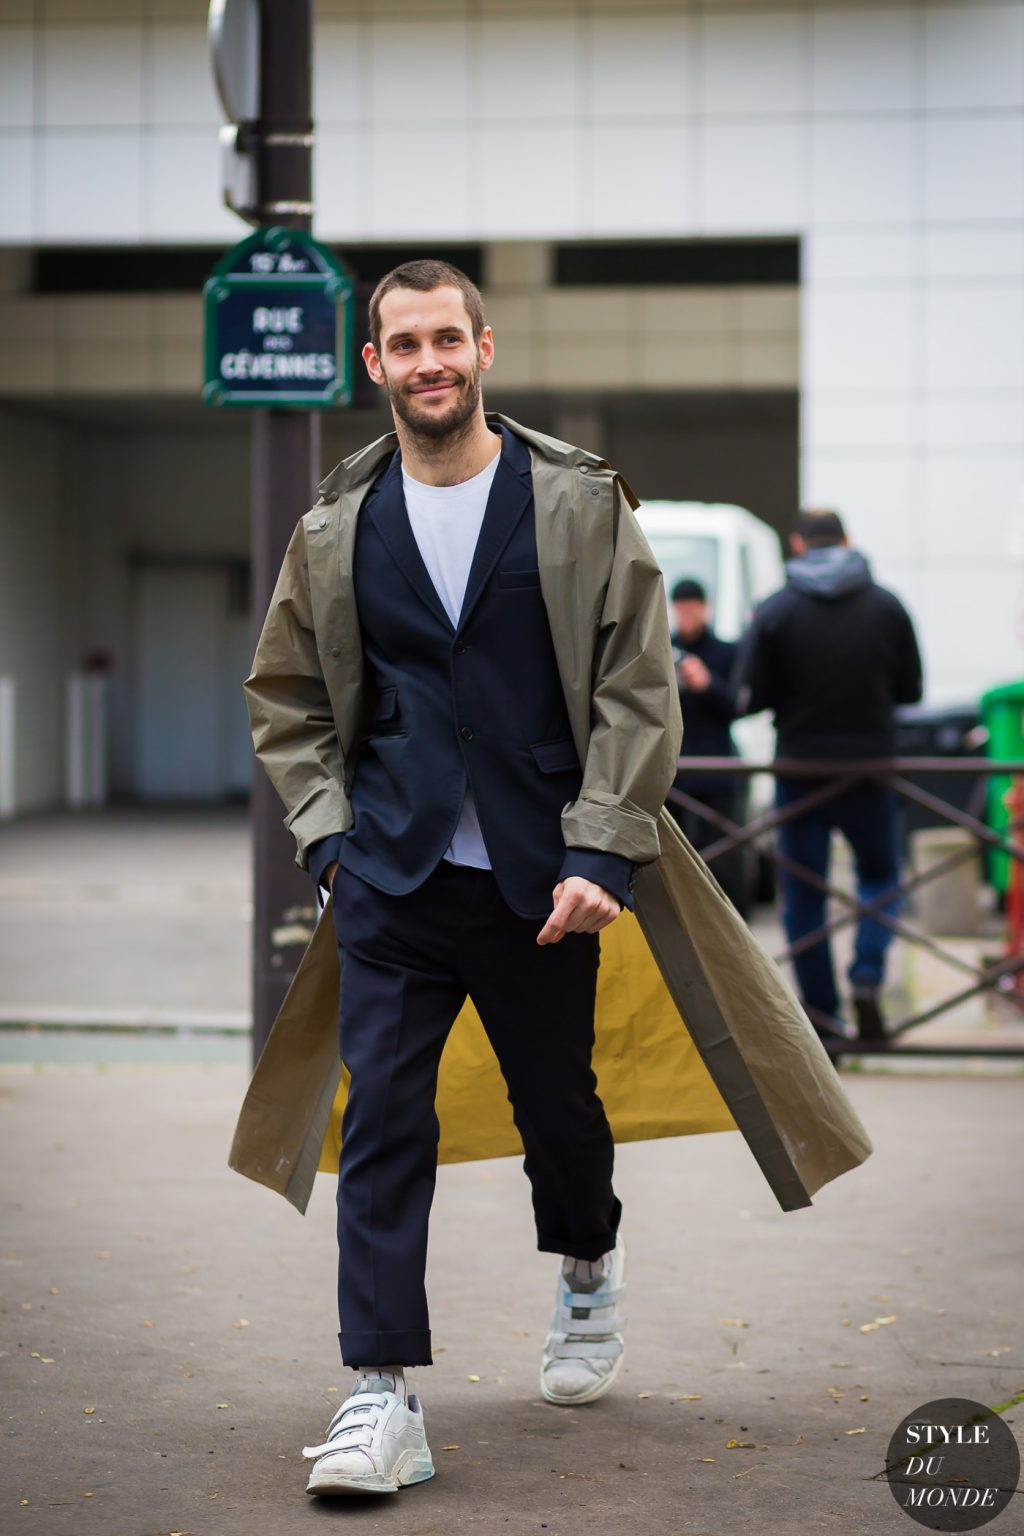 Chi c v y 3000 c l m t nh ng chi c m c i elle vi t nam - Simon porte jacquemus gay ...